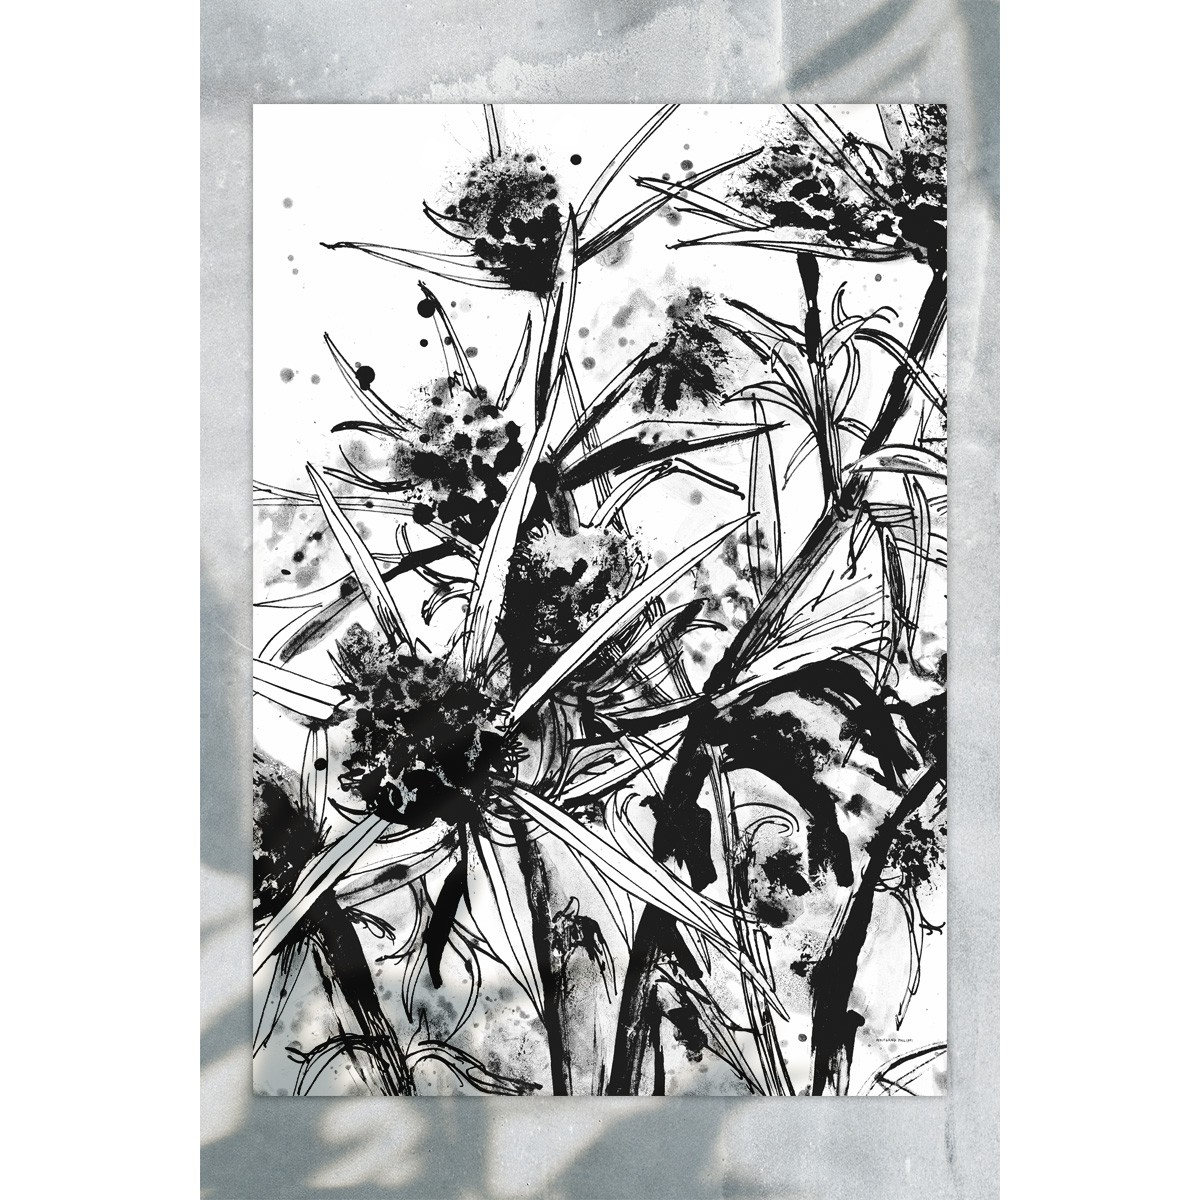 Wolfgang Philippi BANISCHKA Plakat 70x100cm